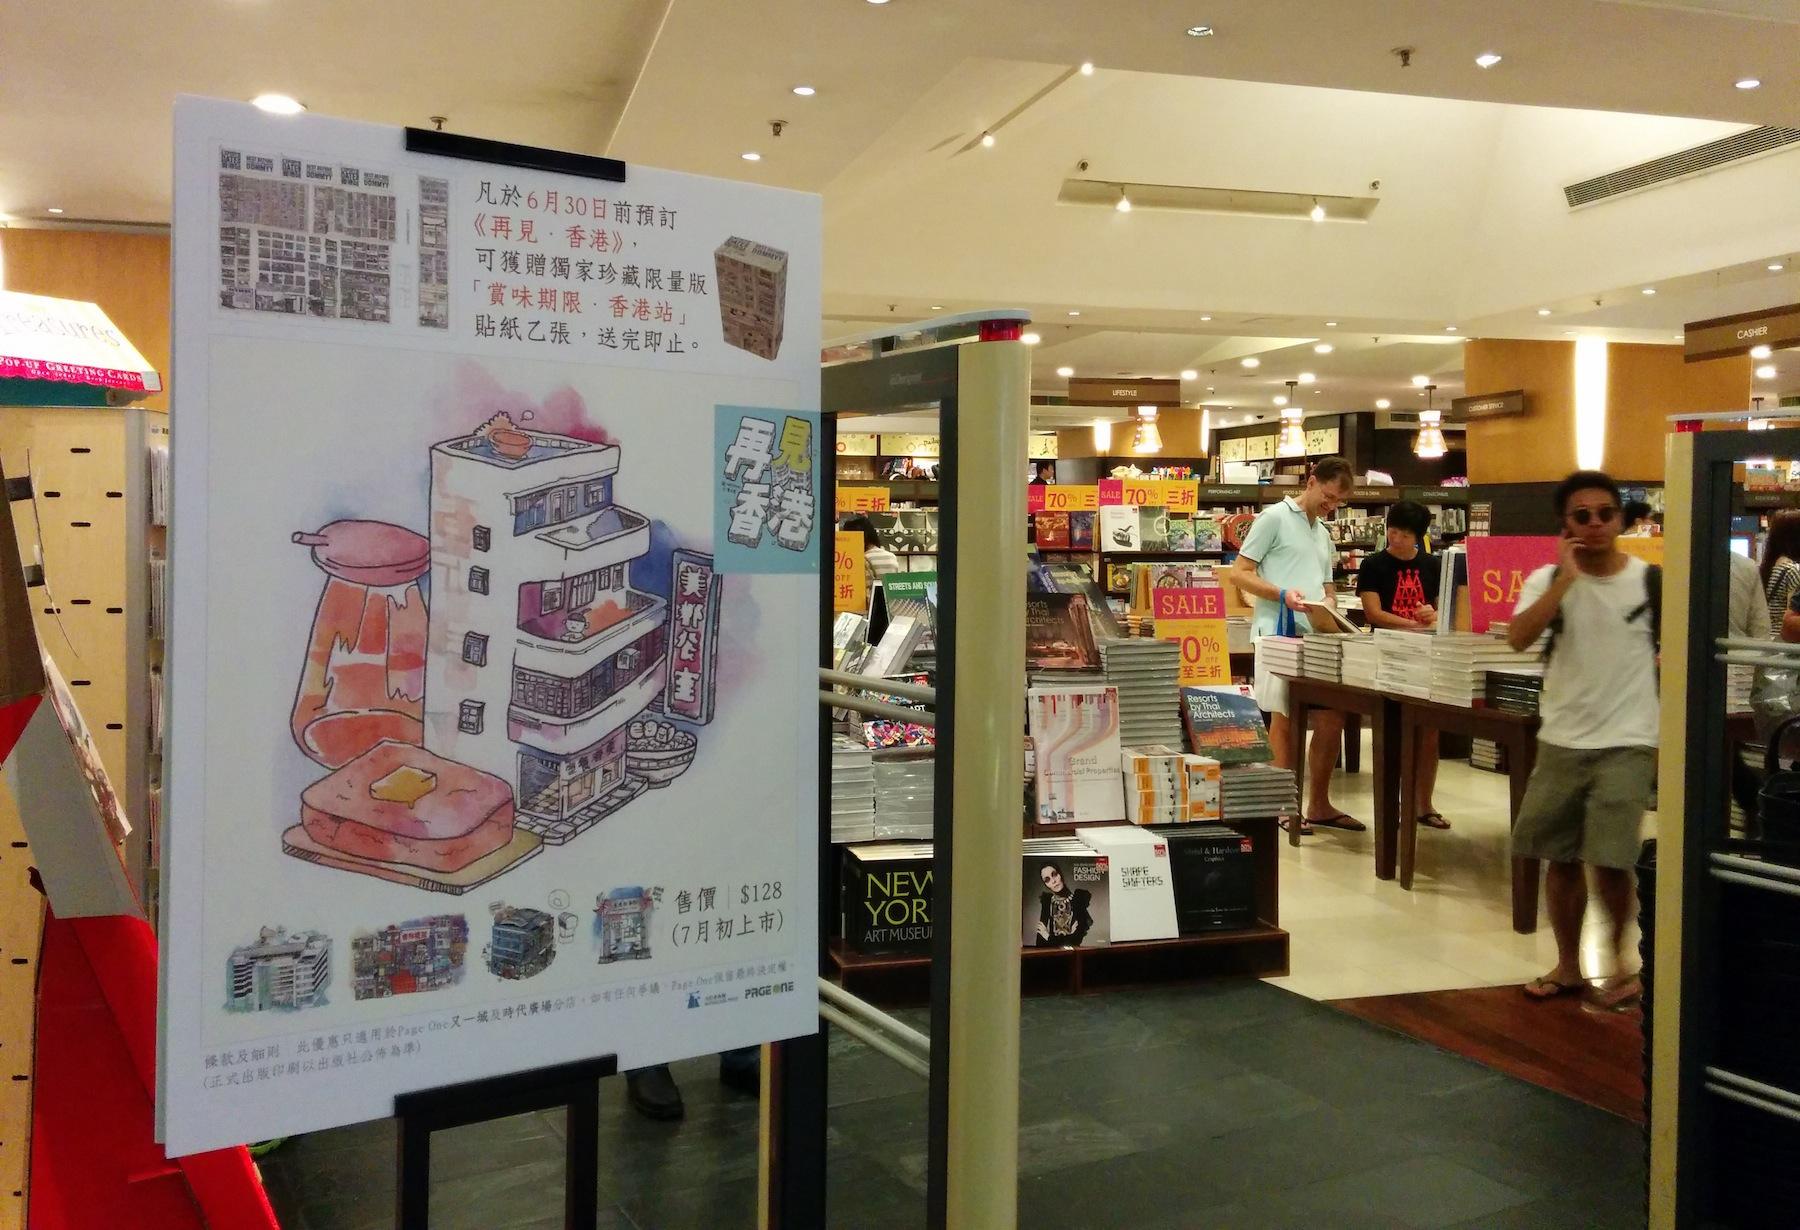 Chinese Book Promotion 中文書籍宣傳(Illustration 插畫 : Angryangry | Design 設計: Rowena Chan)